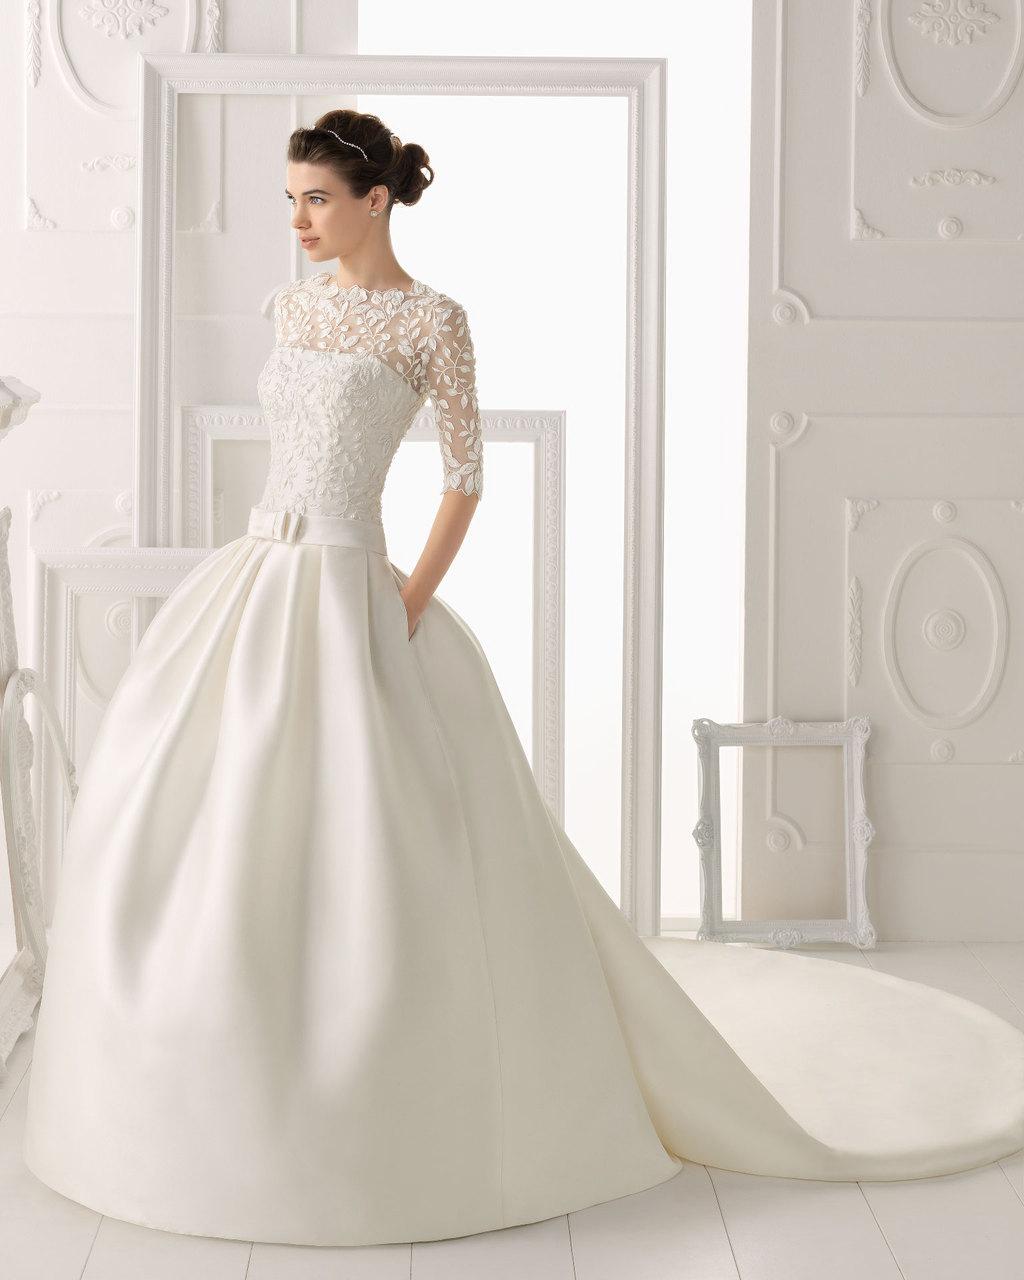 Aire-barcelona-wedding-dress-2014-bridal-orozco.full